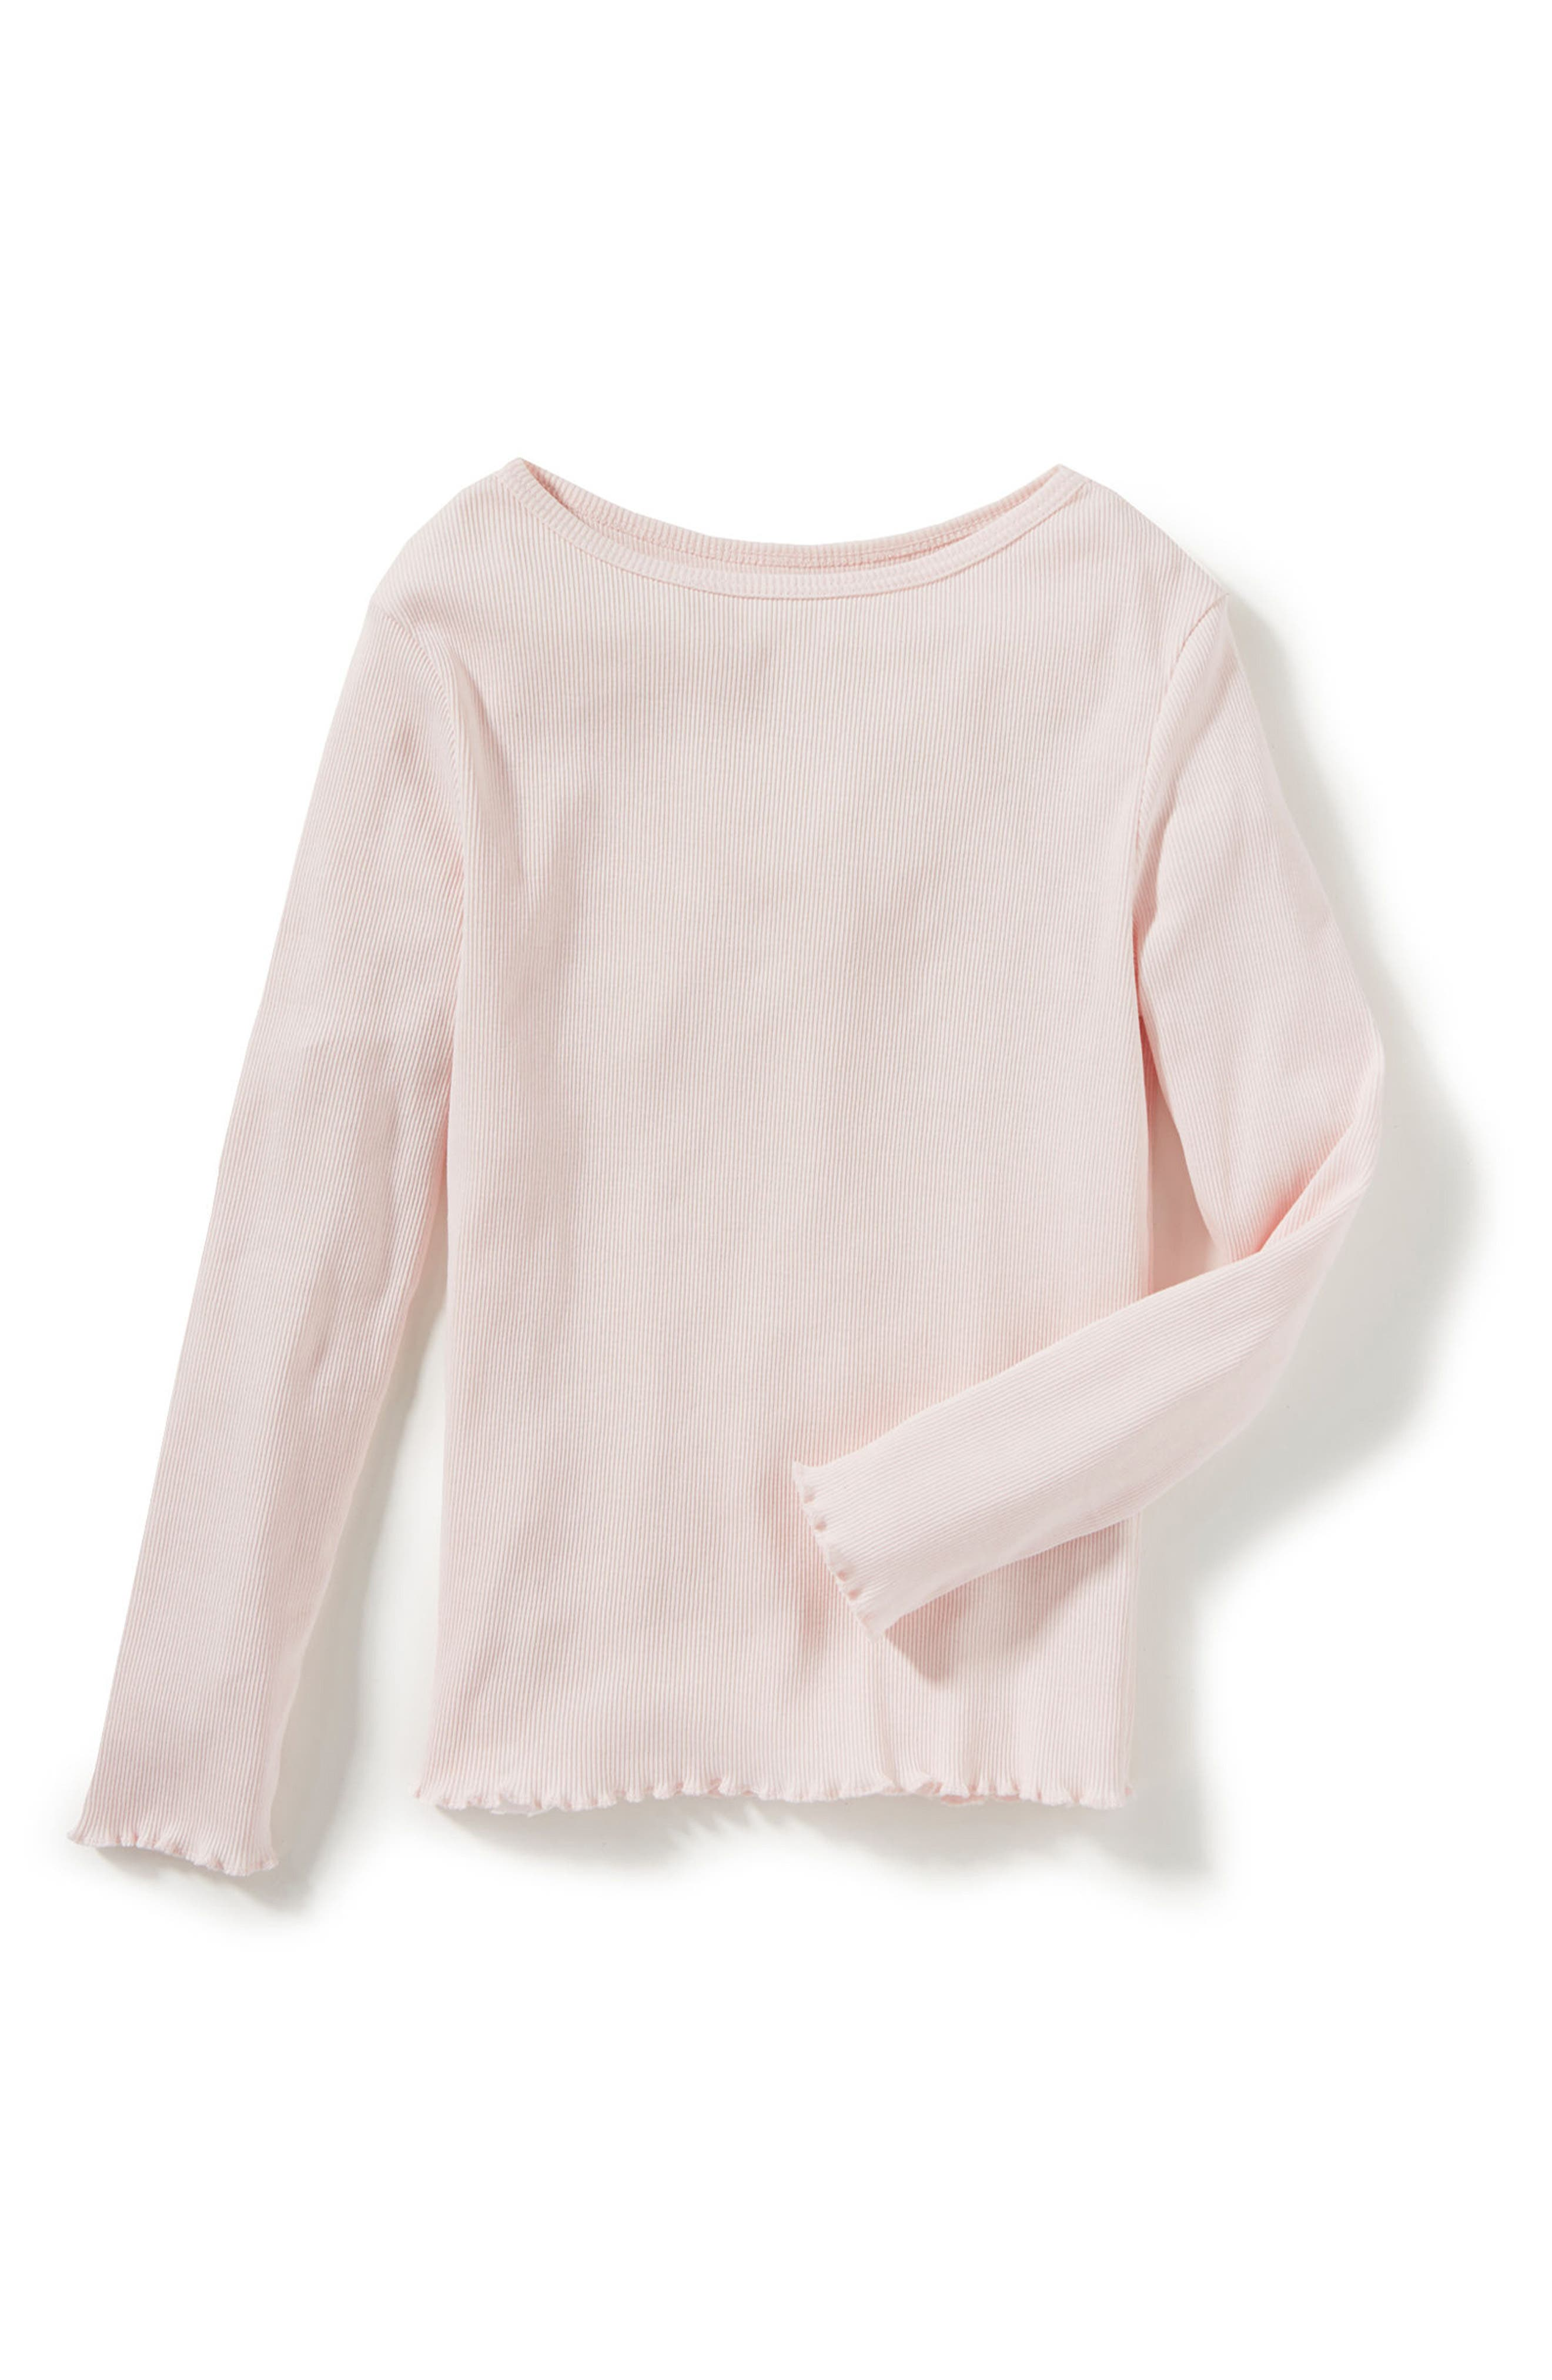 Marie Long Sleeve Tee,                         Main,                         color, Light Pink